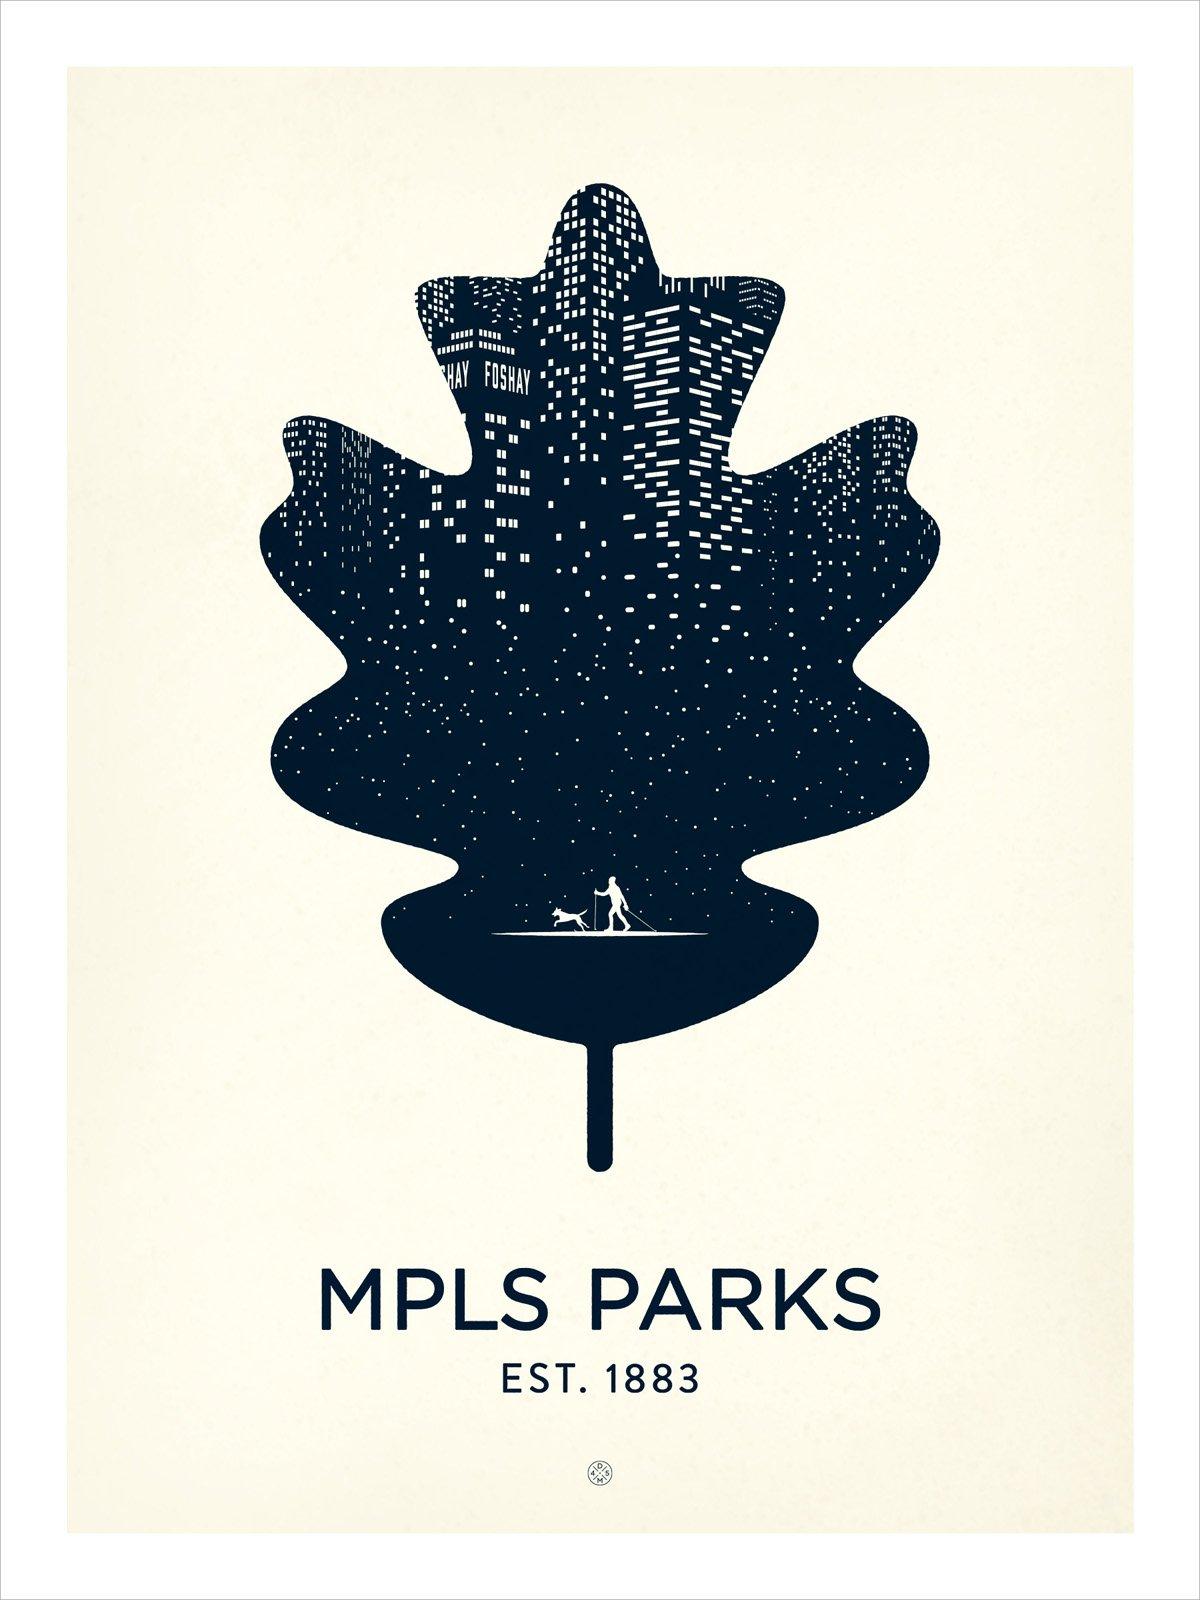 MPLS Parks poster by Karl Schweikart